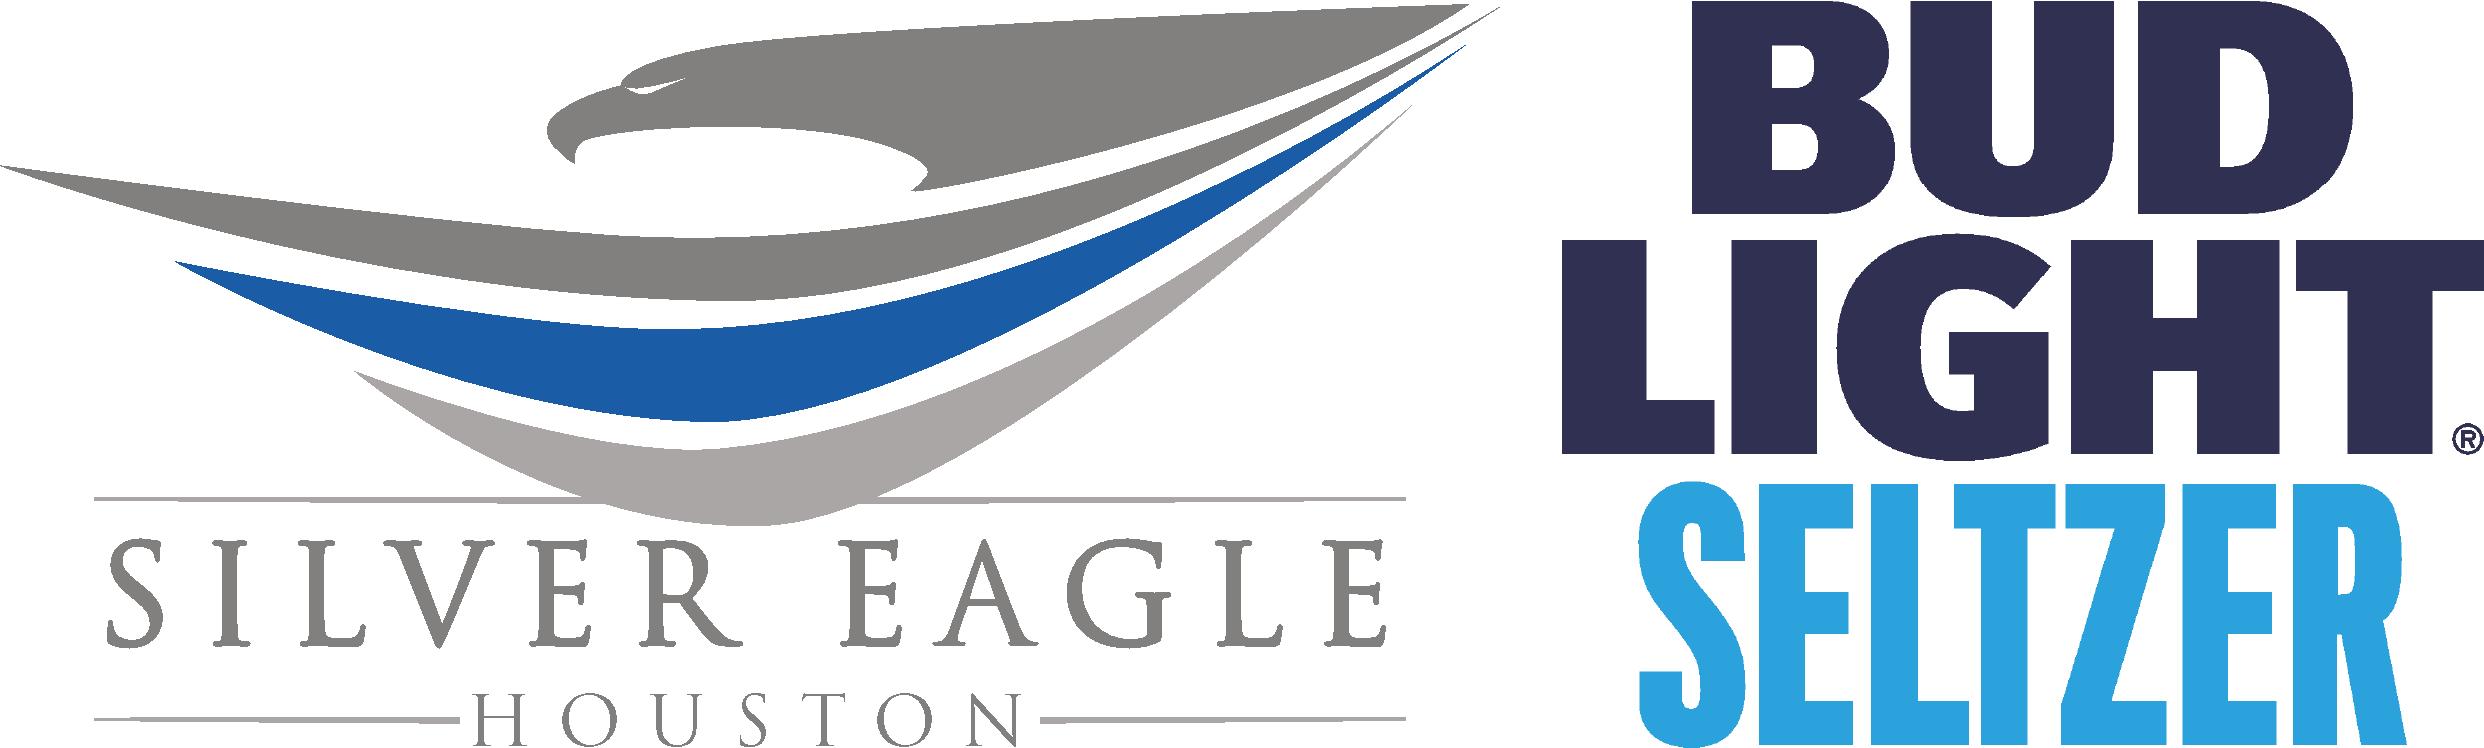 https://growthzonesitesprod.azureedge.net/wp-content/uploads/sites/787/2021/07/Silver-Eagle-combo-logos-cropped-no-back.png